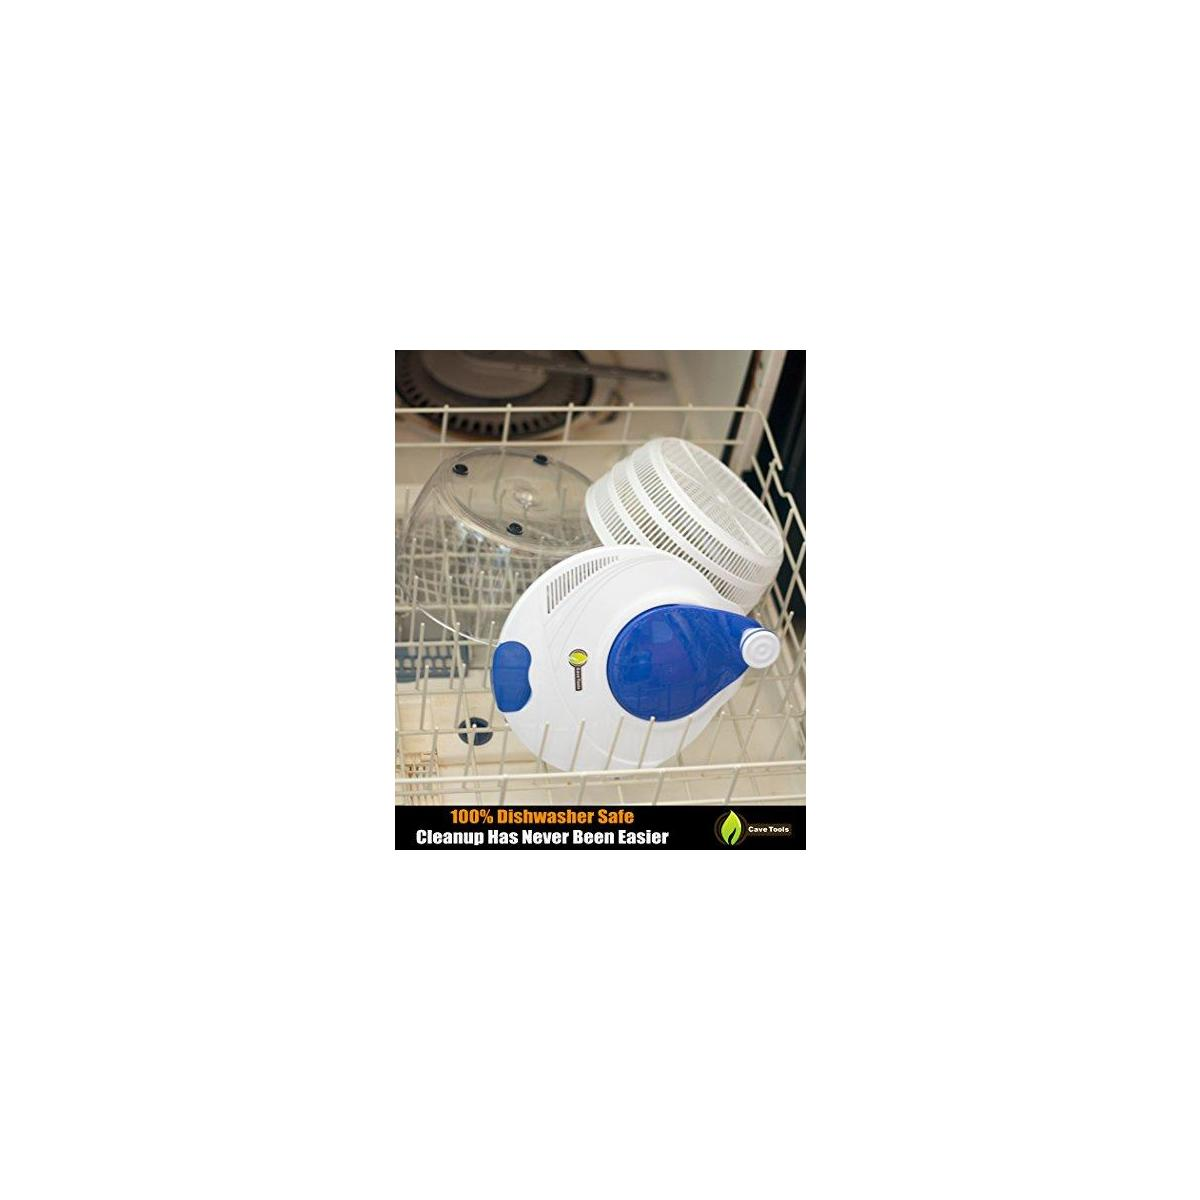 Vegetable Grill Basket + Salad Spinner Large Serving Bowl Set - Quick Dry Design & Dishwasher Safe - BPA Free Plastic Base - No Pump Pull String or Cord Needed, Turn Knob Drys Fruits & Veggies Fast